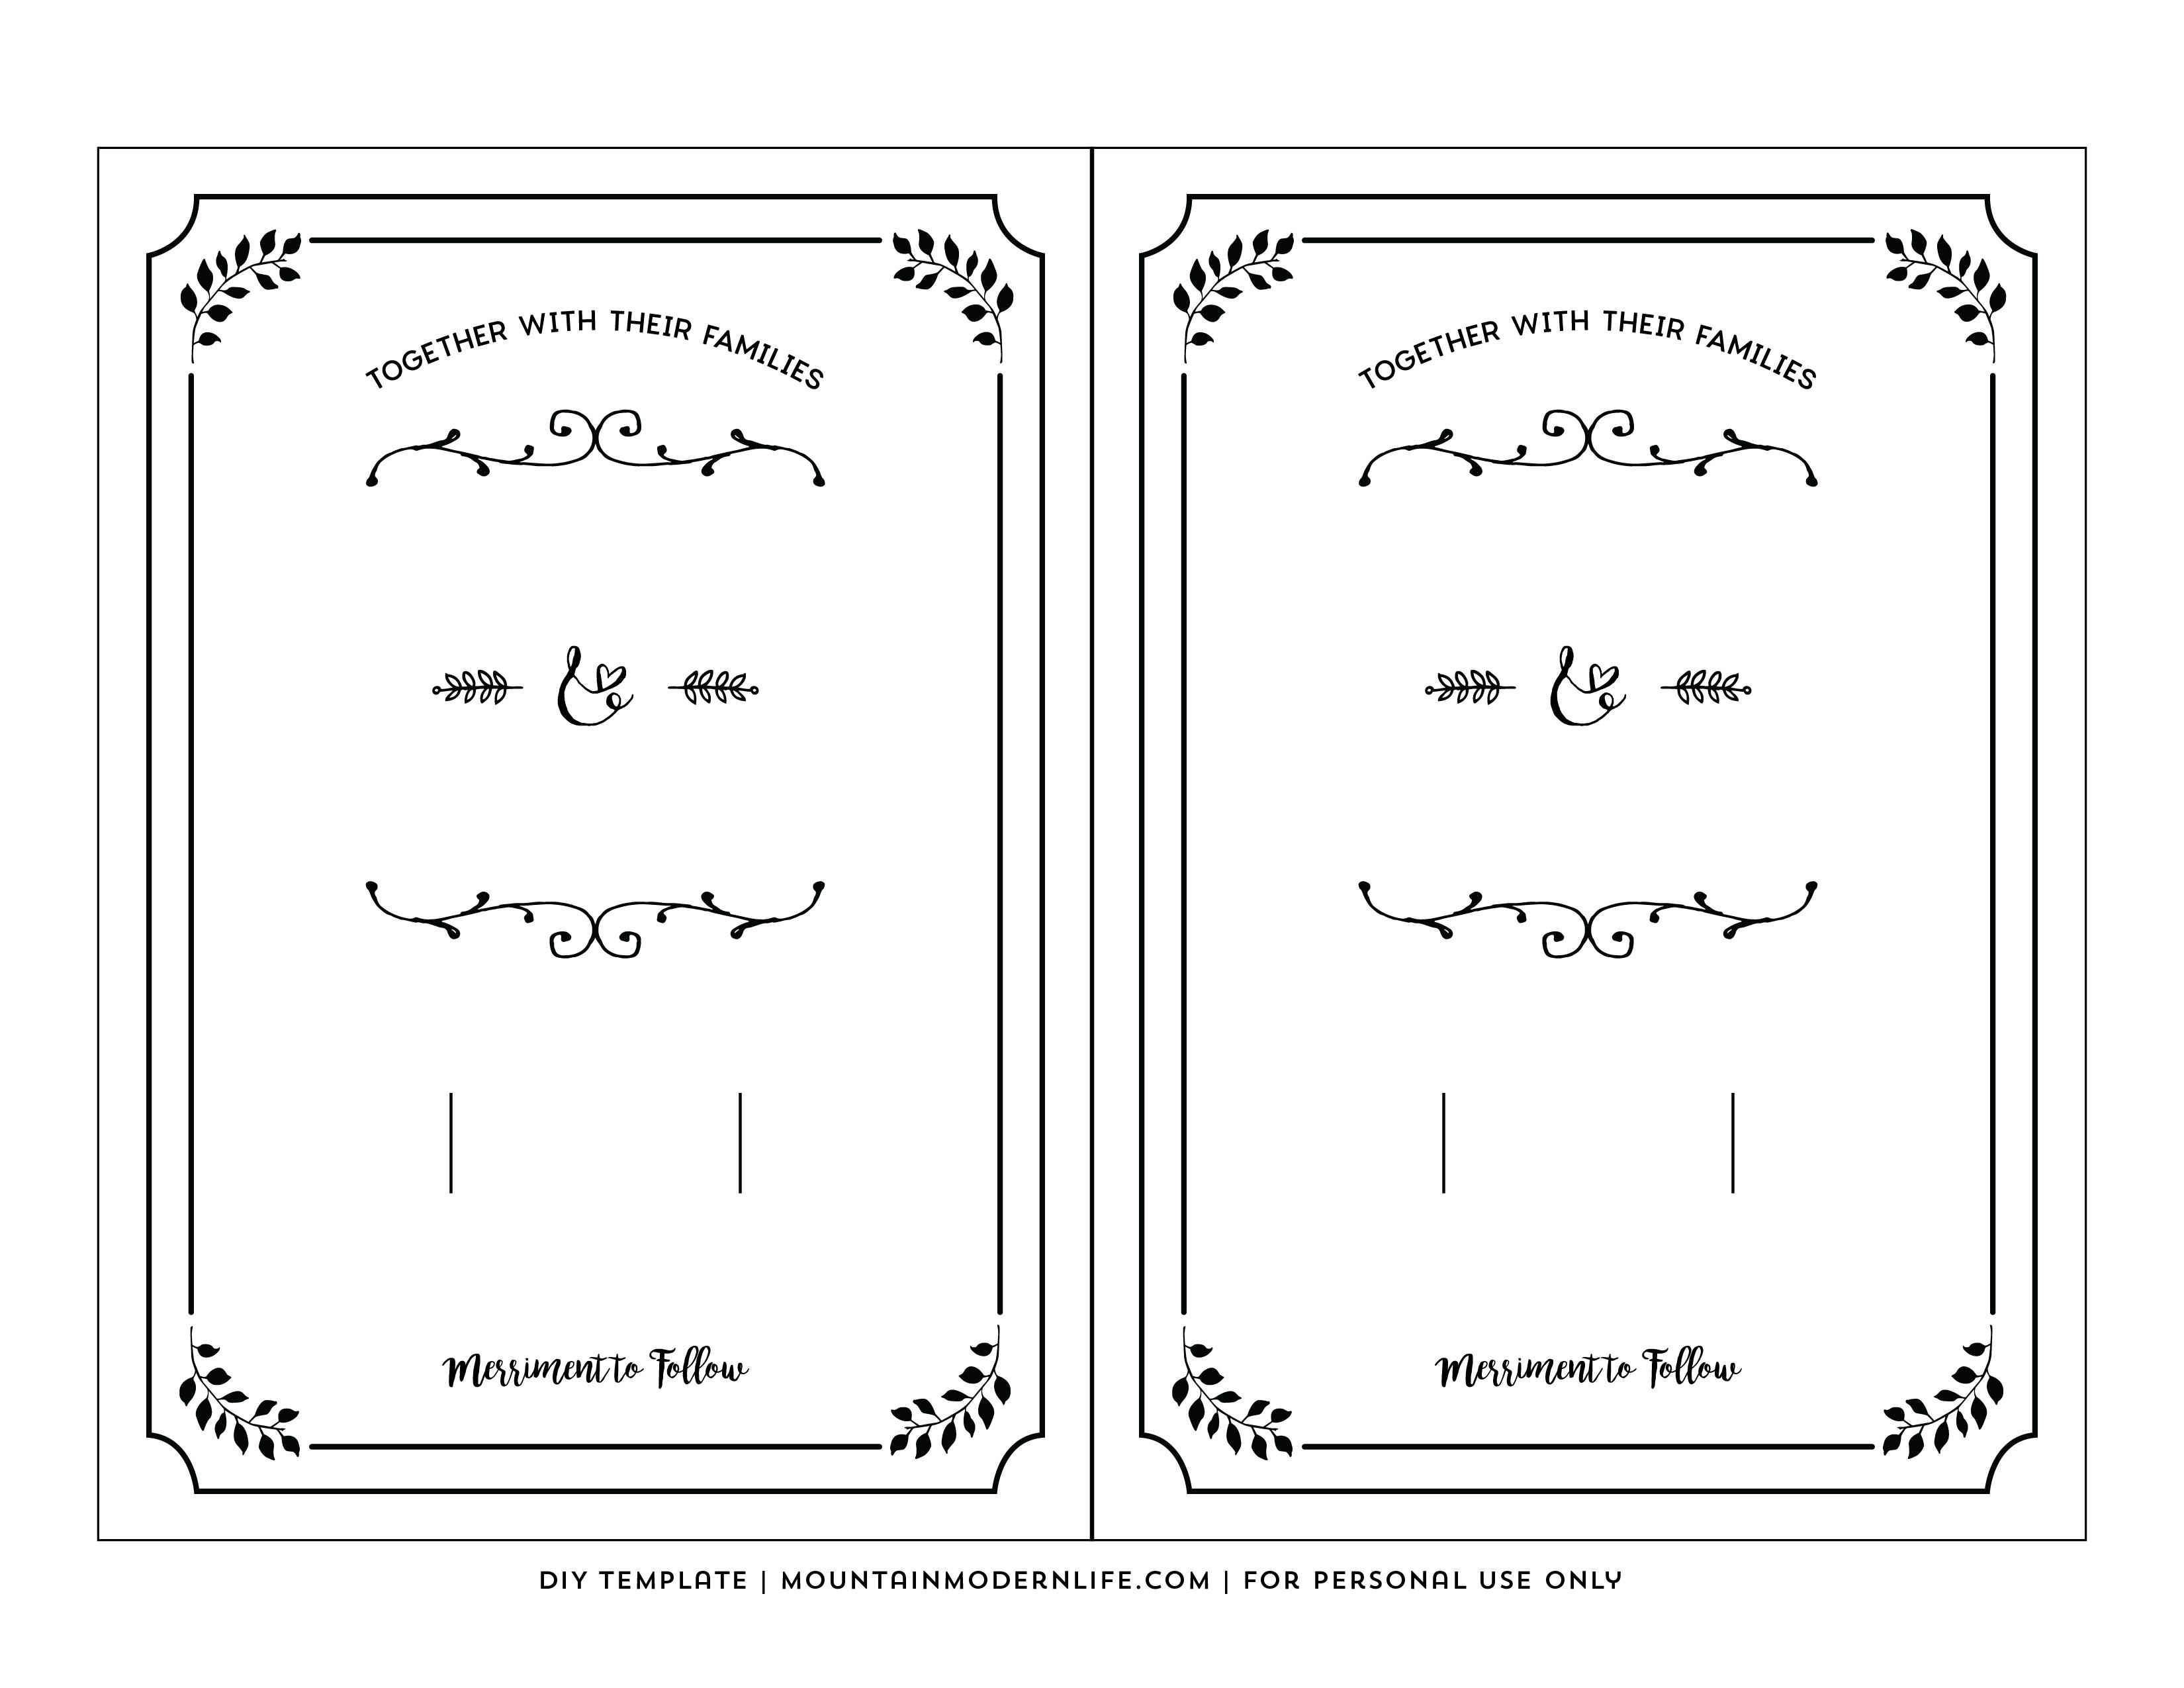 Free Printable Wedding Invitation Template - Free Printable Wedding Invitations